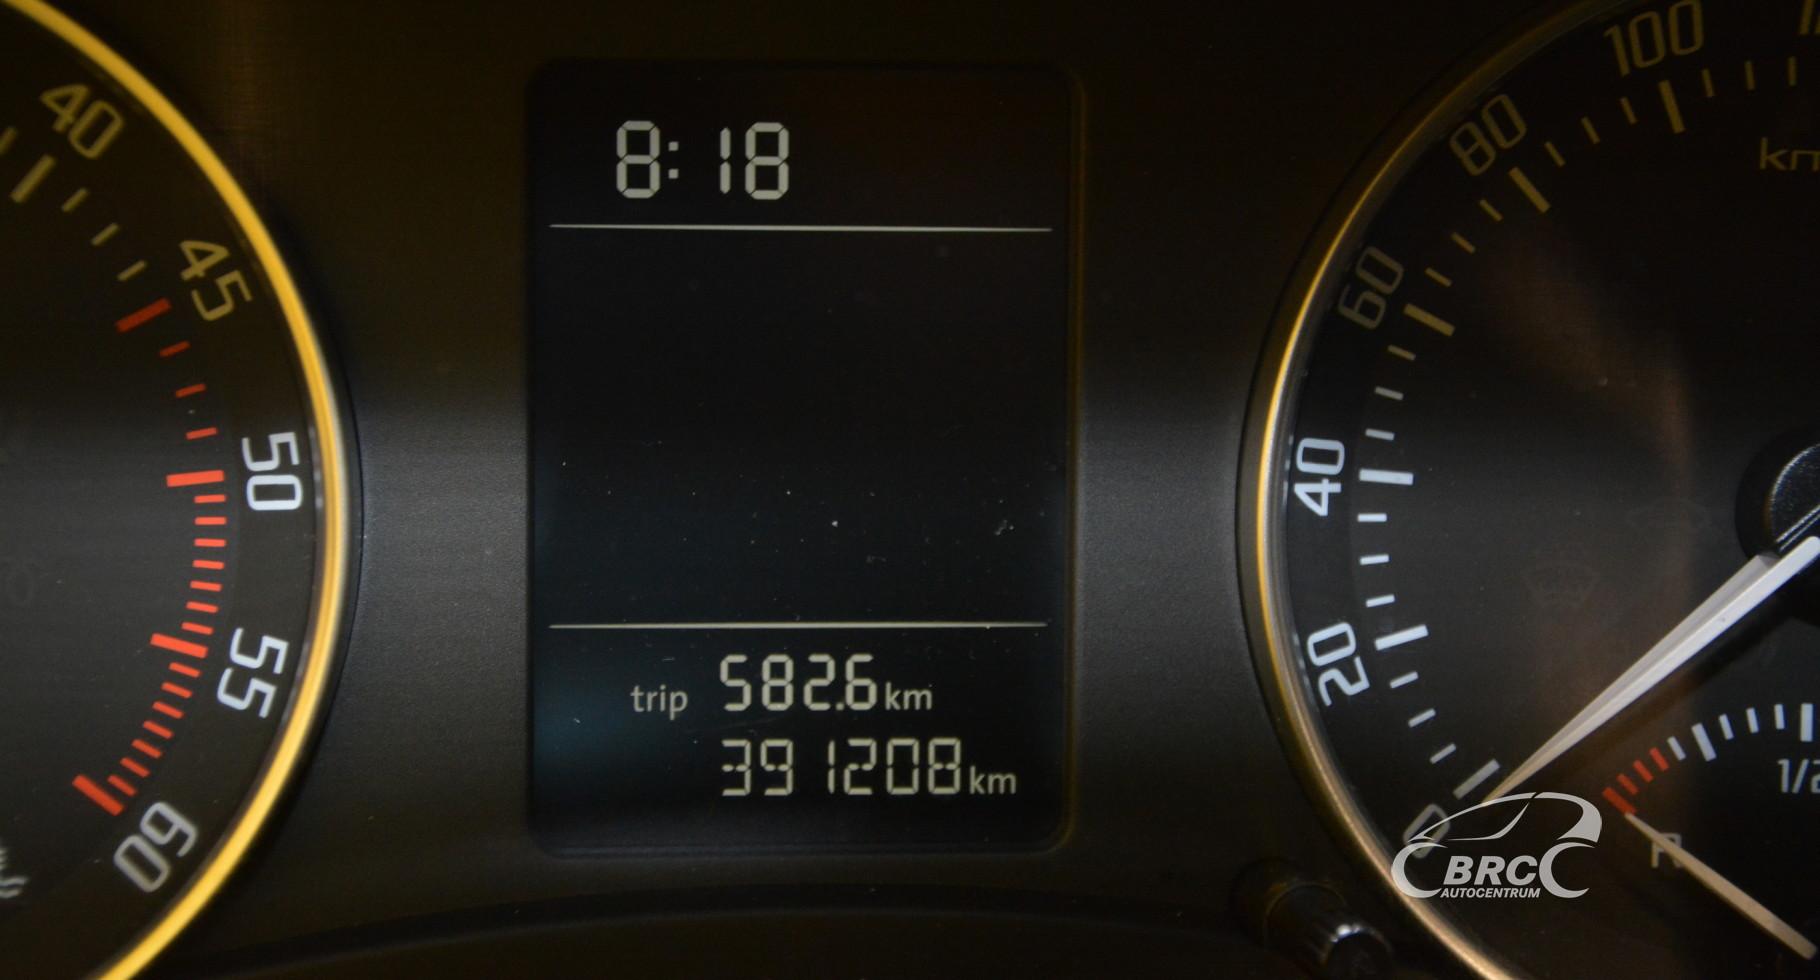 Skoda Octavia 1.9 TDI Ambiente Combi